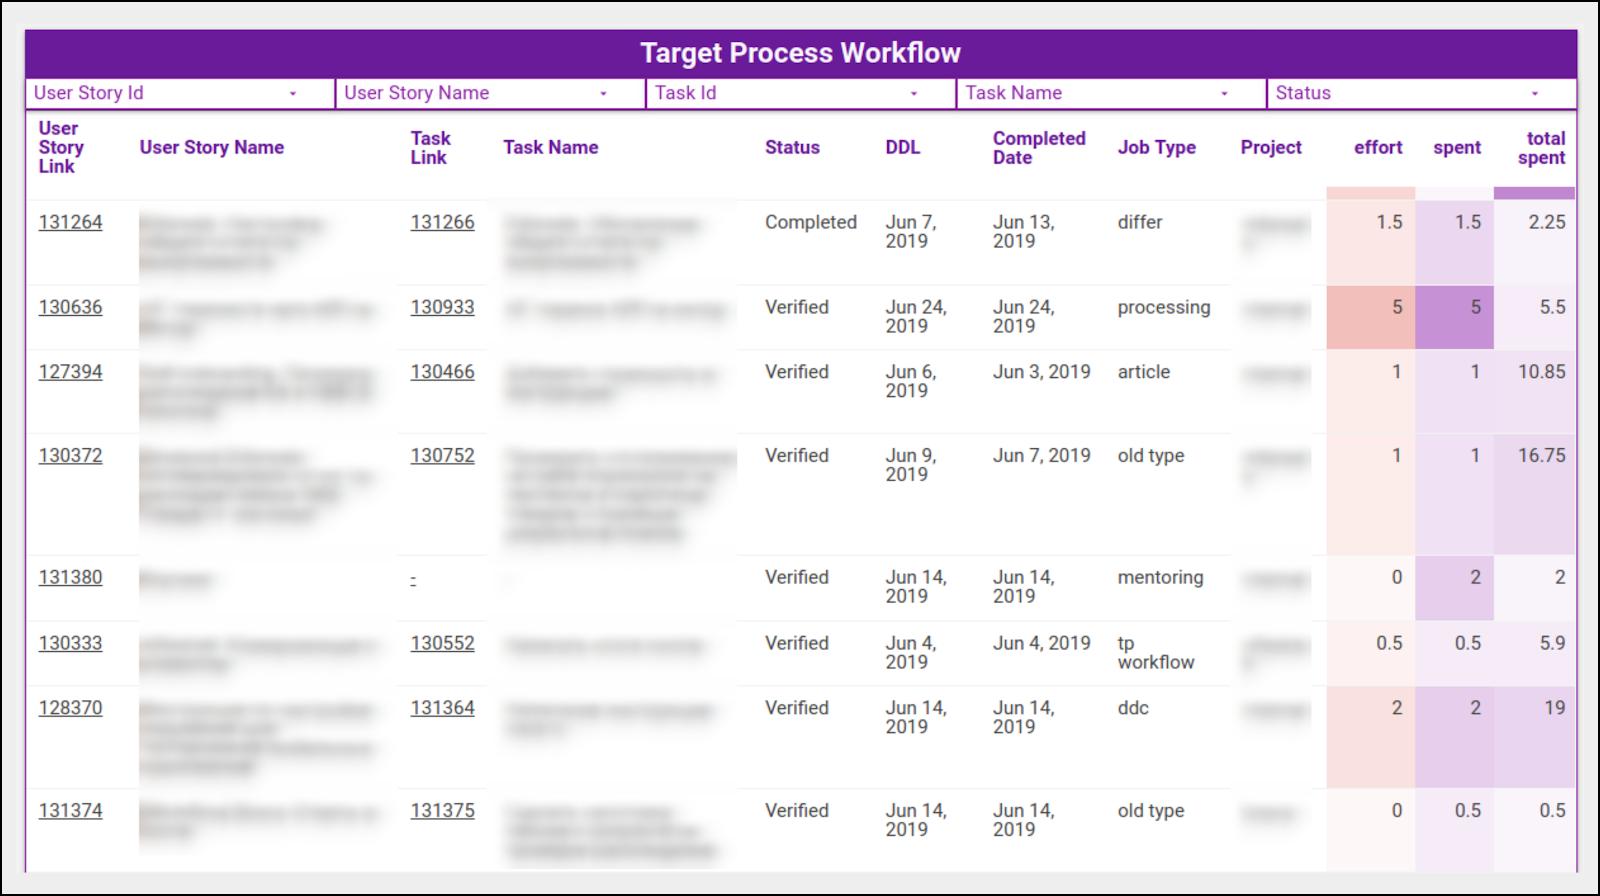 esempio flusso di lavoro targetprocess.